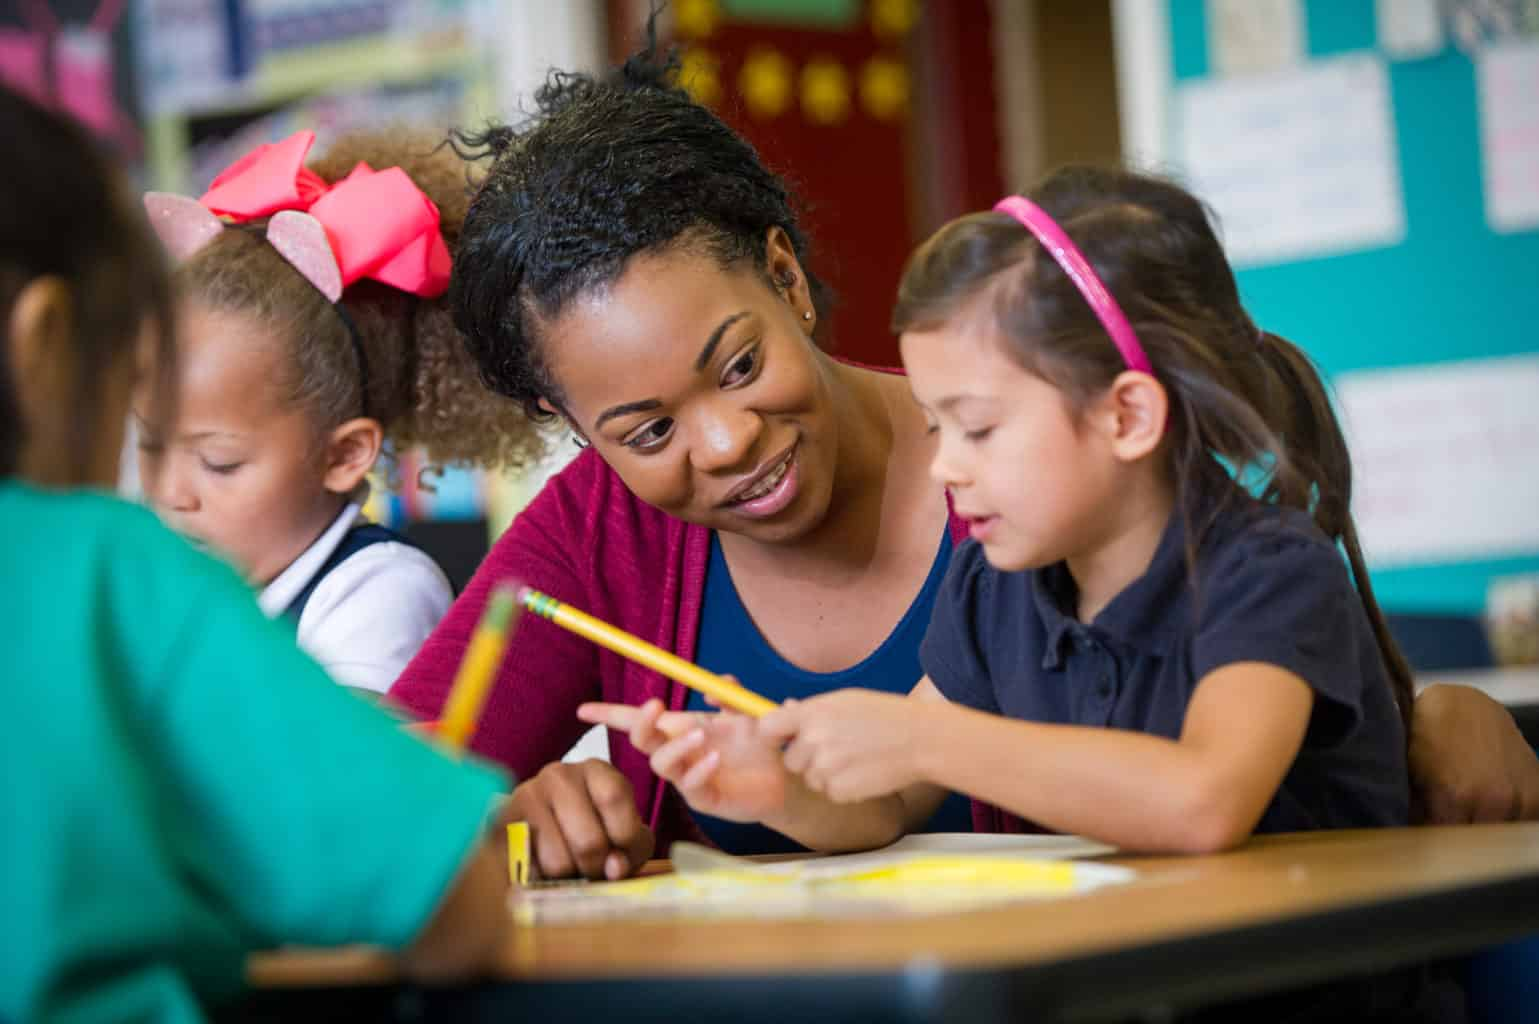 Female teacher with elementary age girl at school desk.